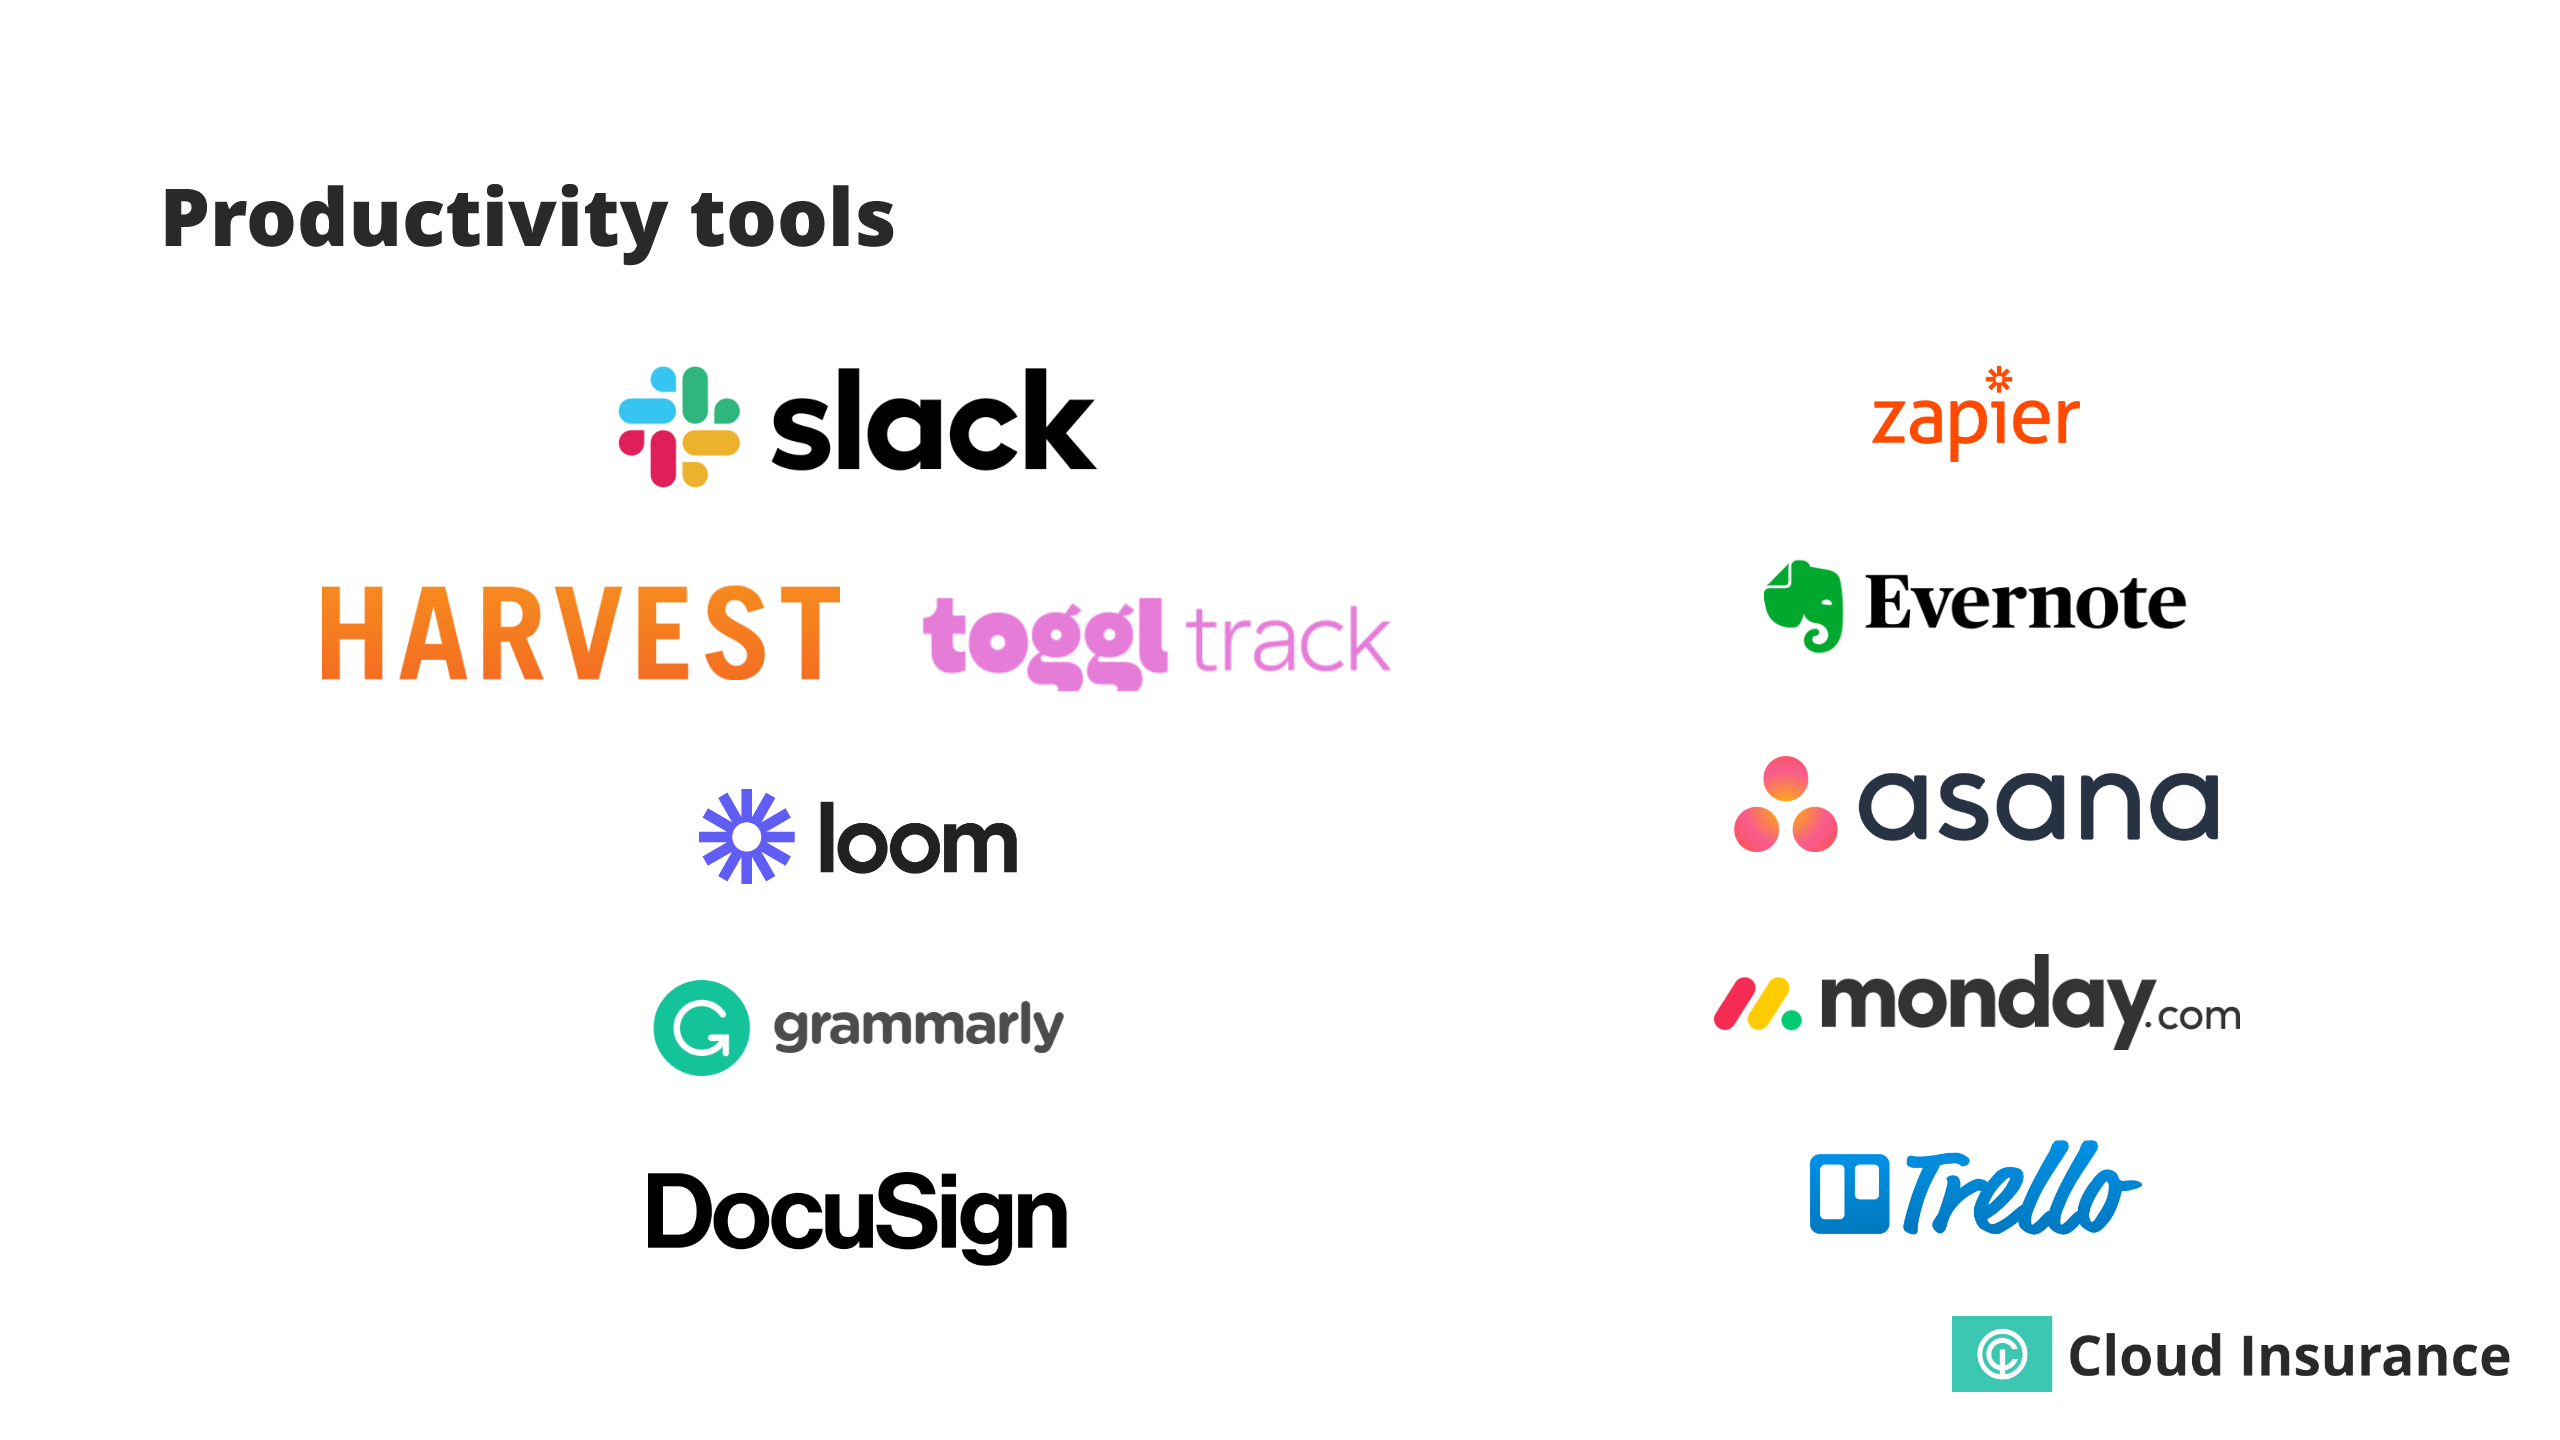 Sample of productivity tools.